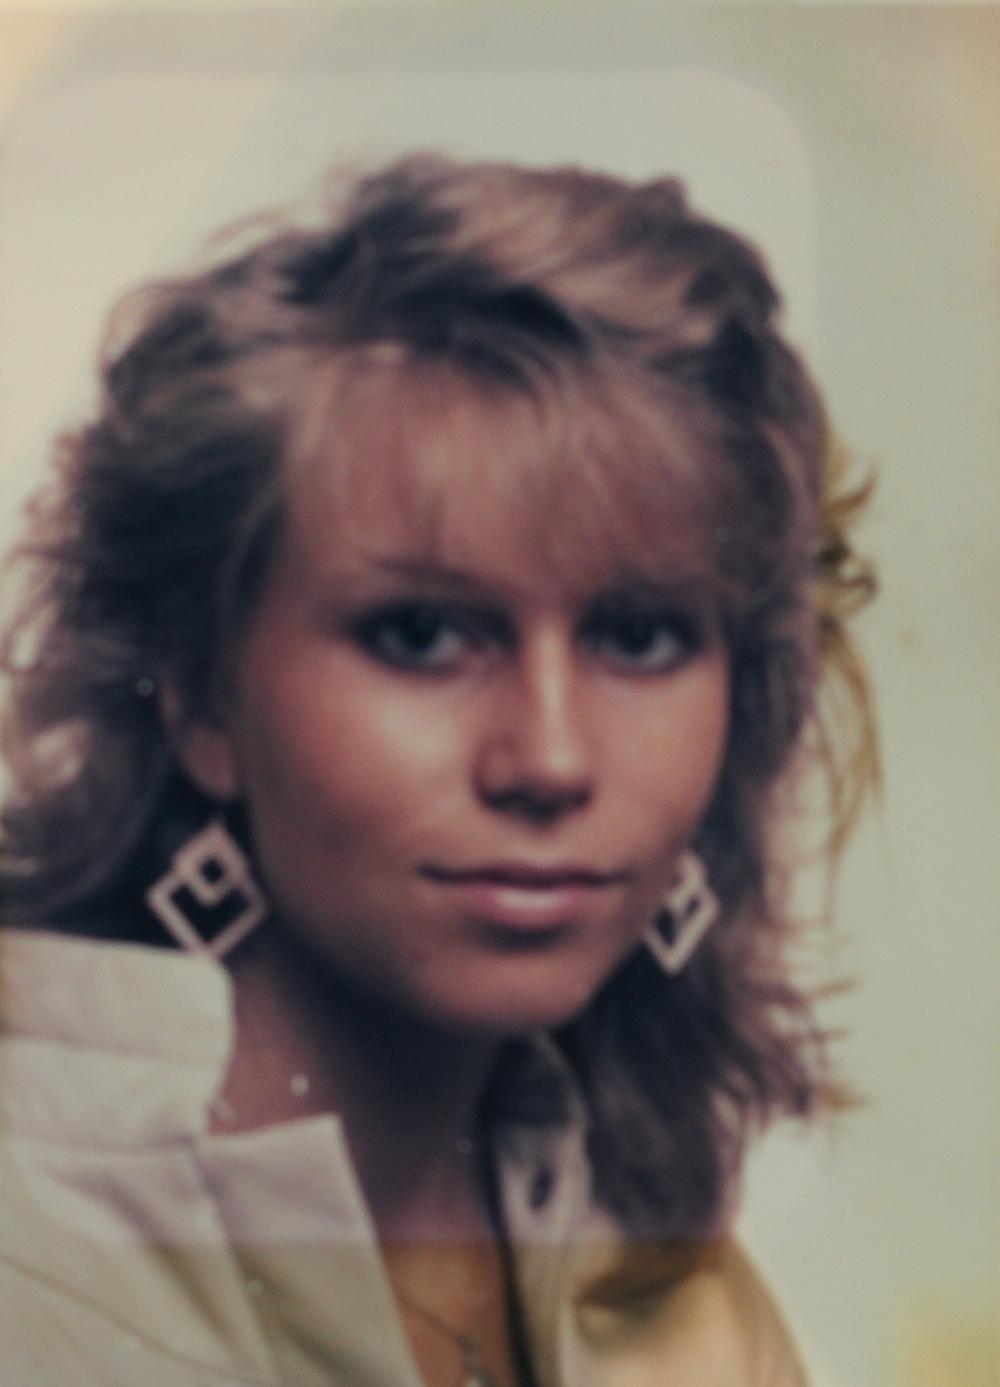 ca. 1984